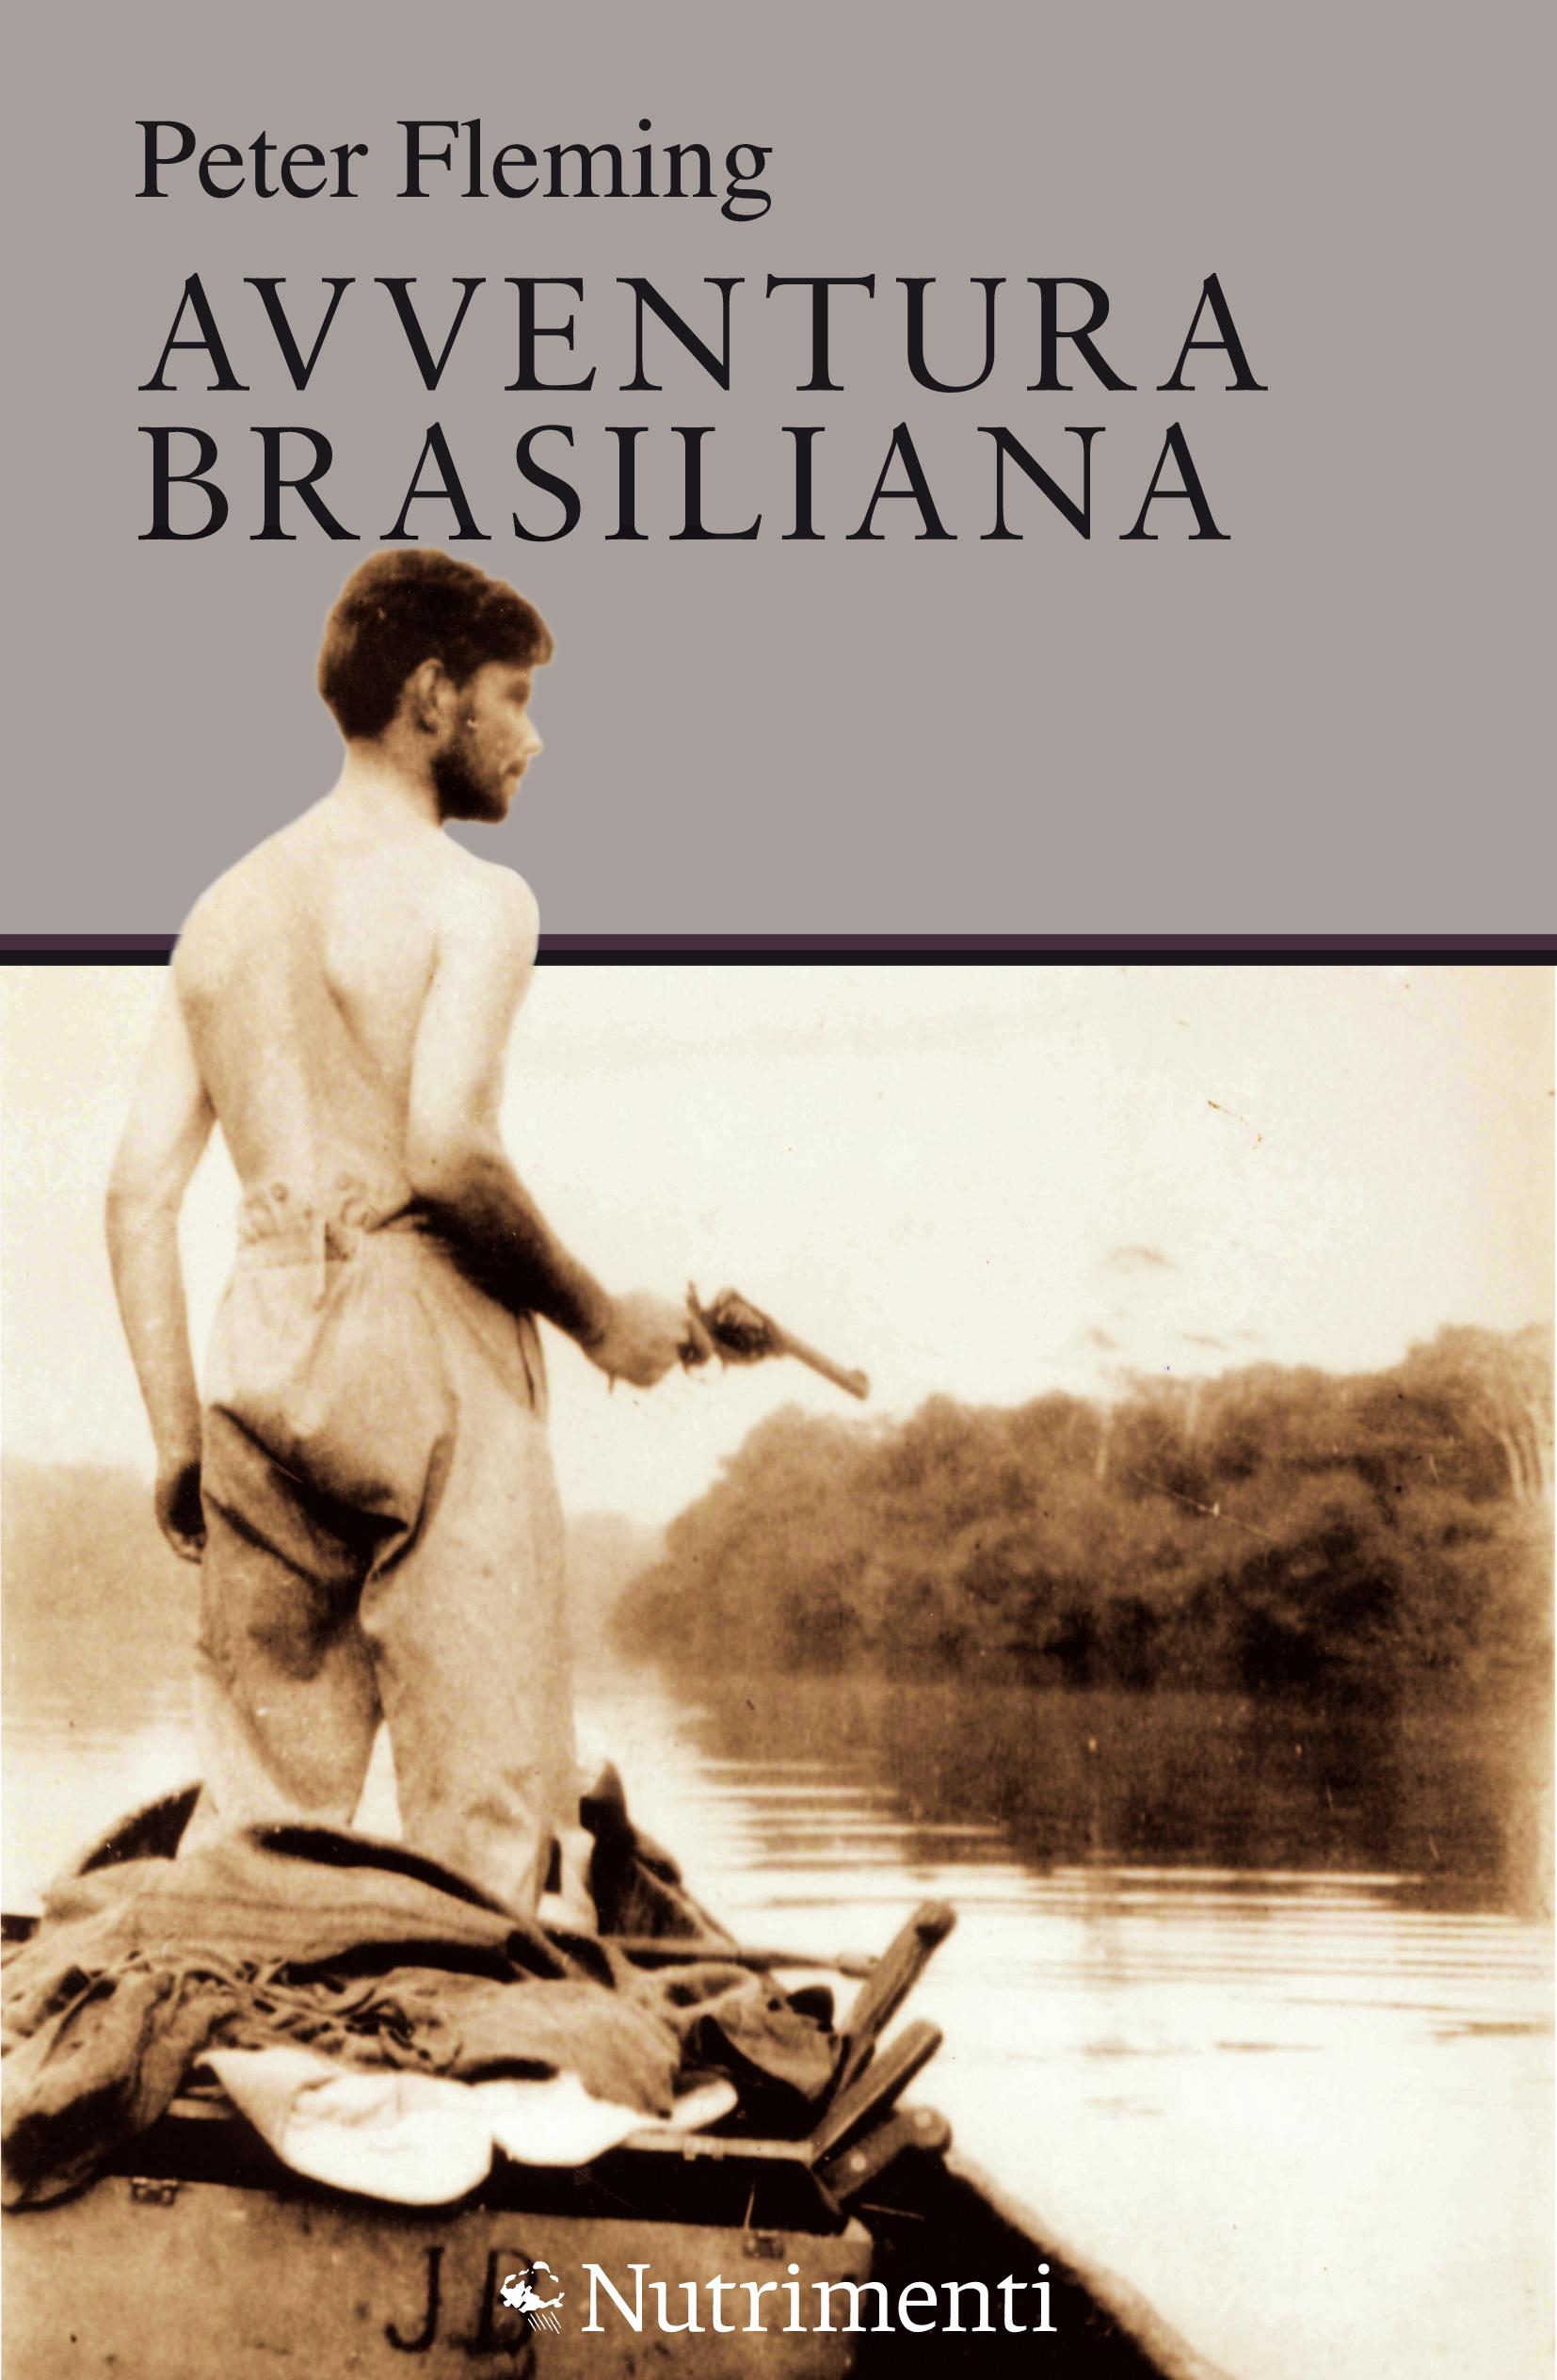 Avventura brasiliana